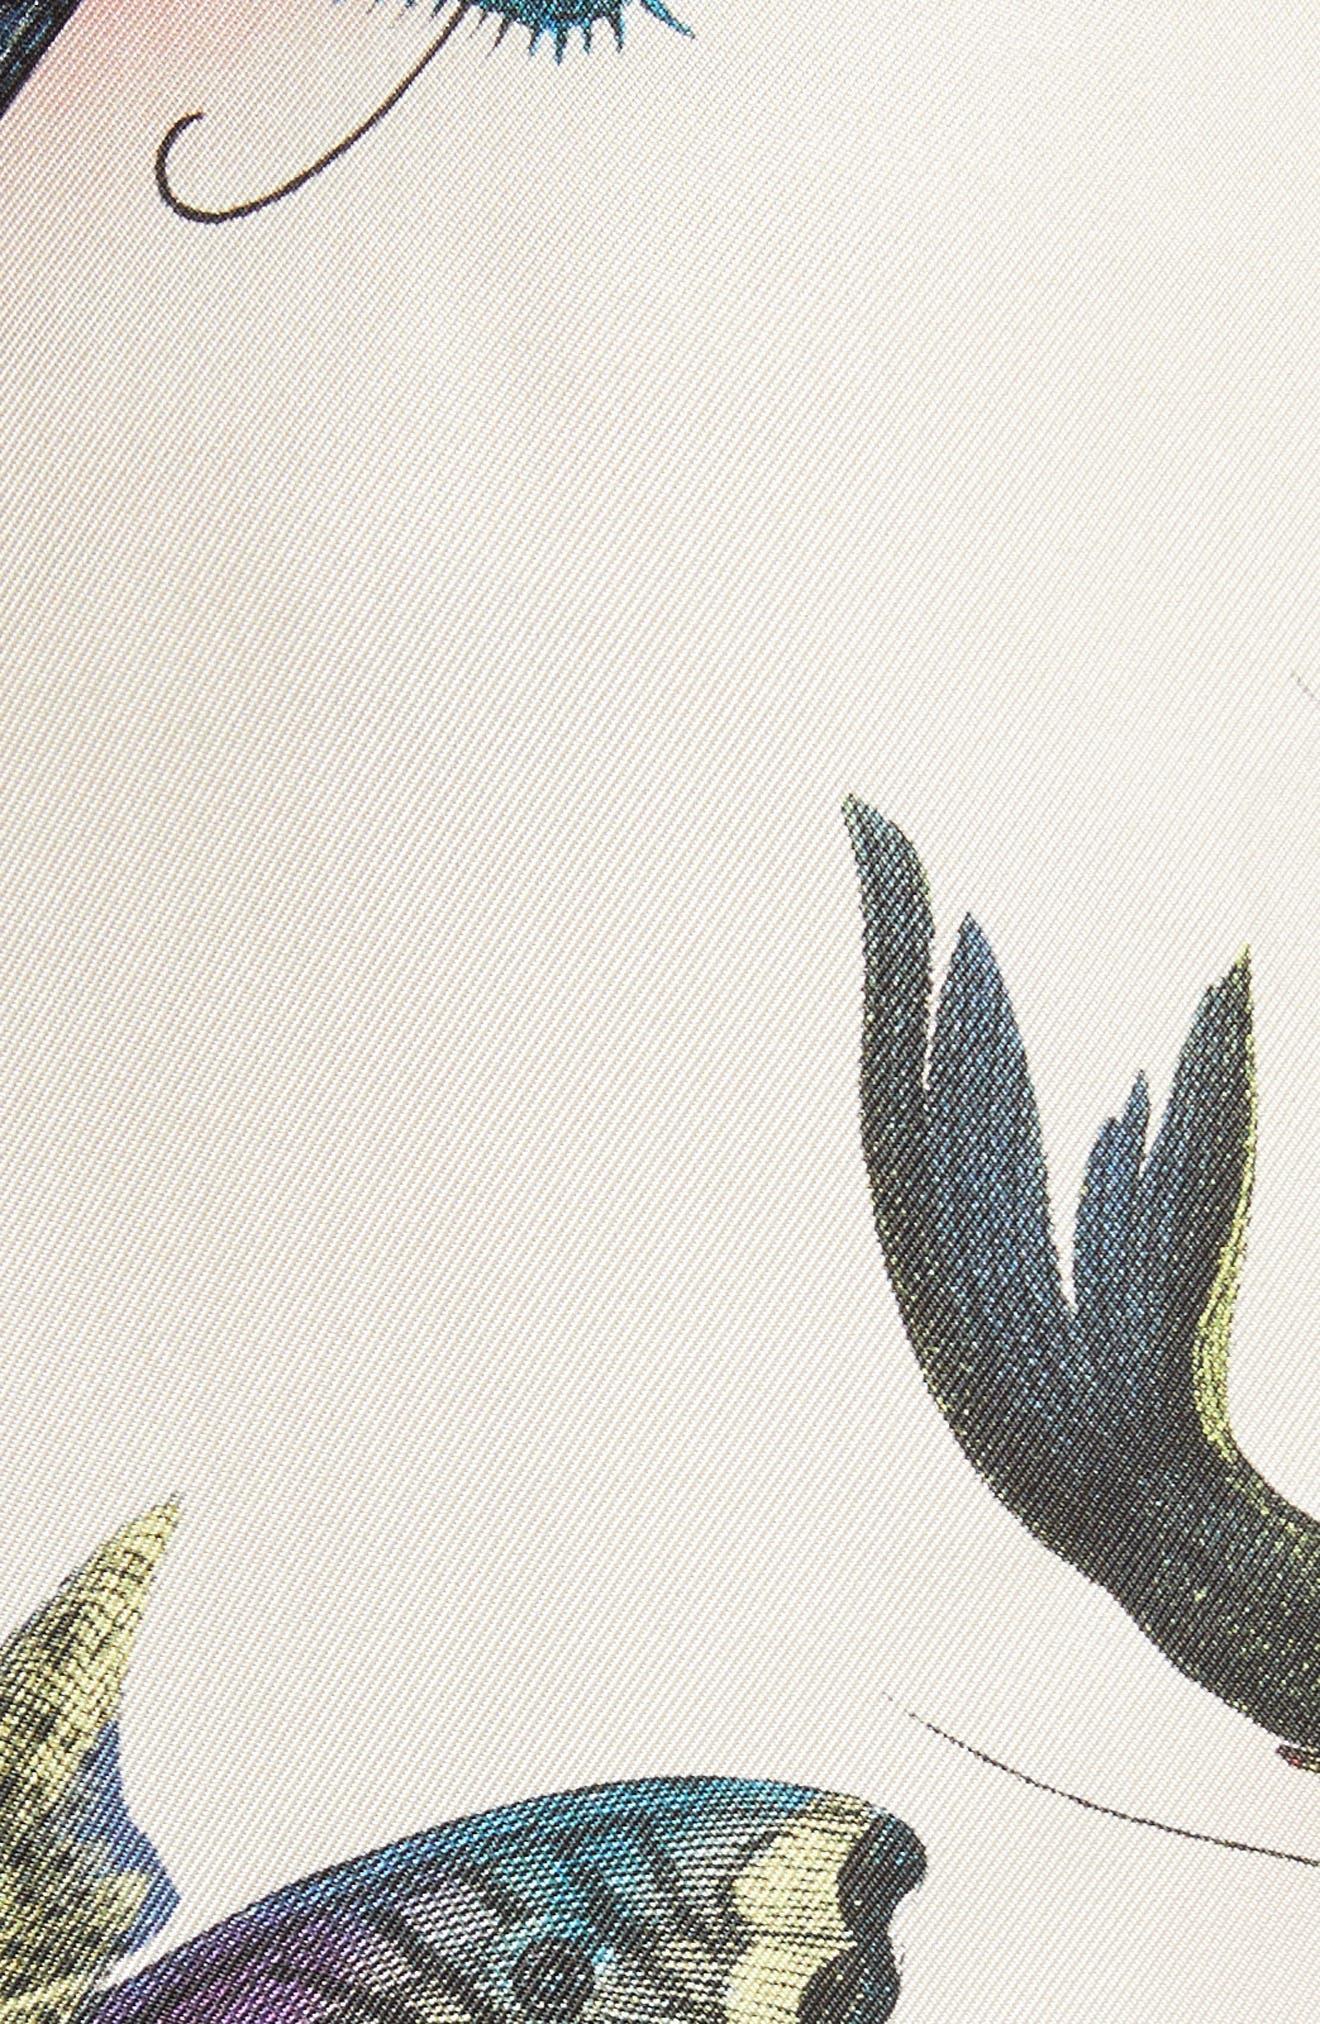 Flying Fish Silk Bowling Shirt,                             Alternate thumbnail 5, color,                             9273 Ivory